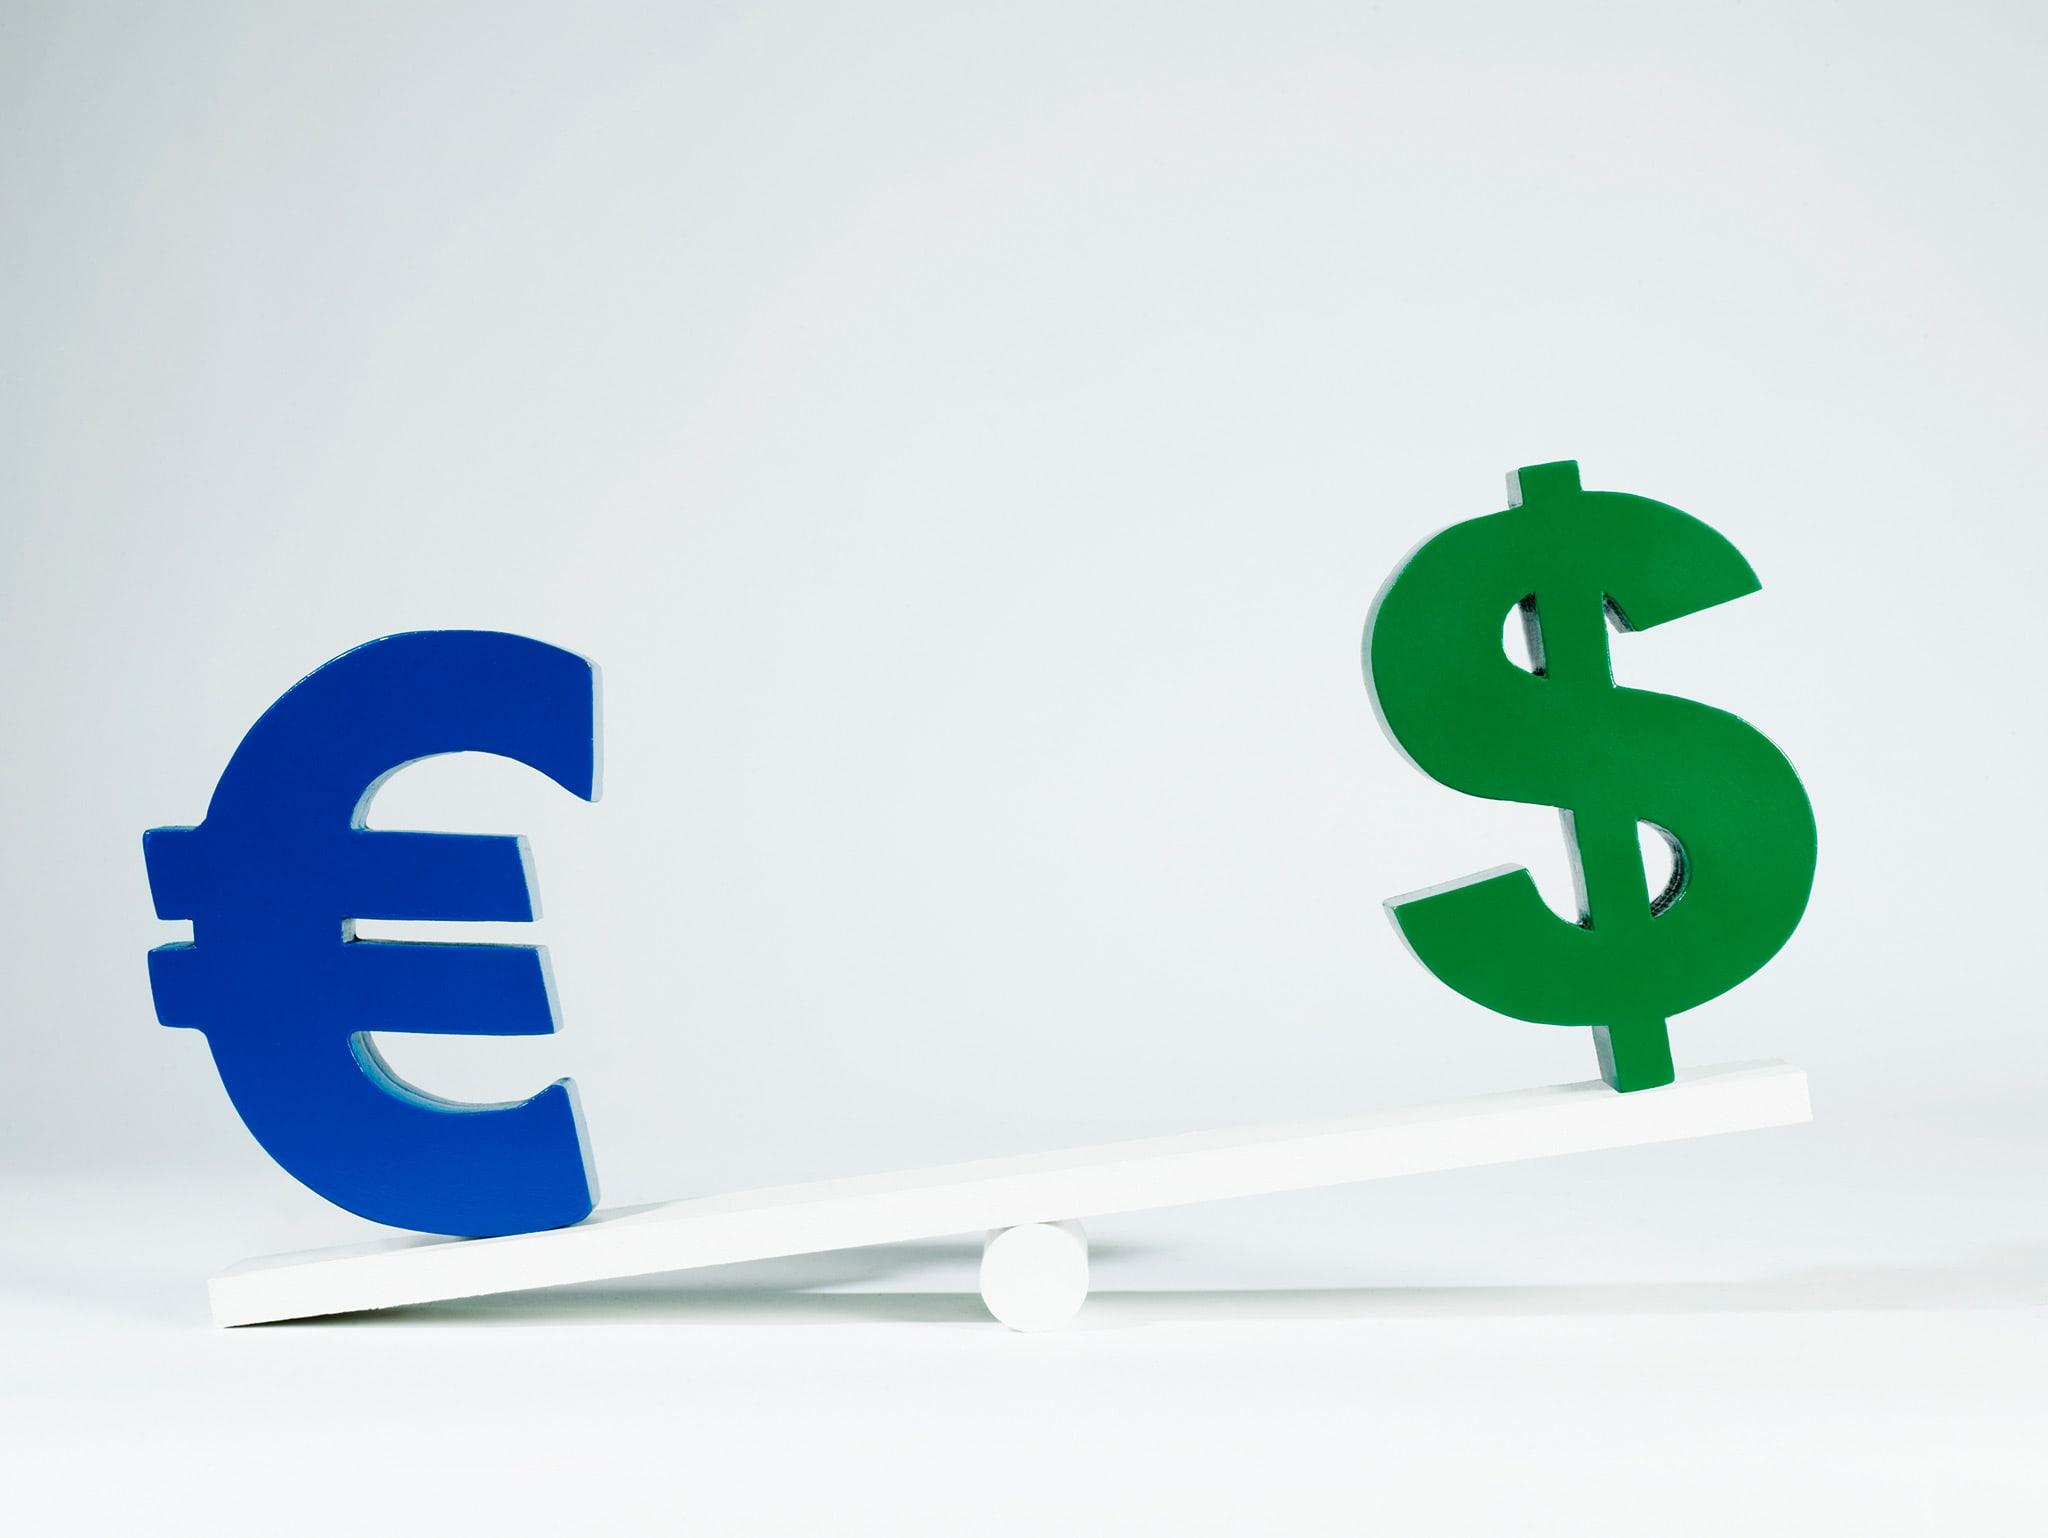 Strategist Beware The Euros Strength